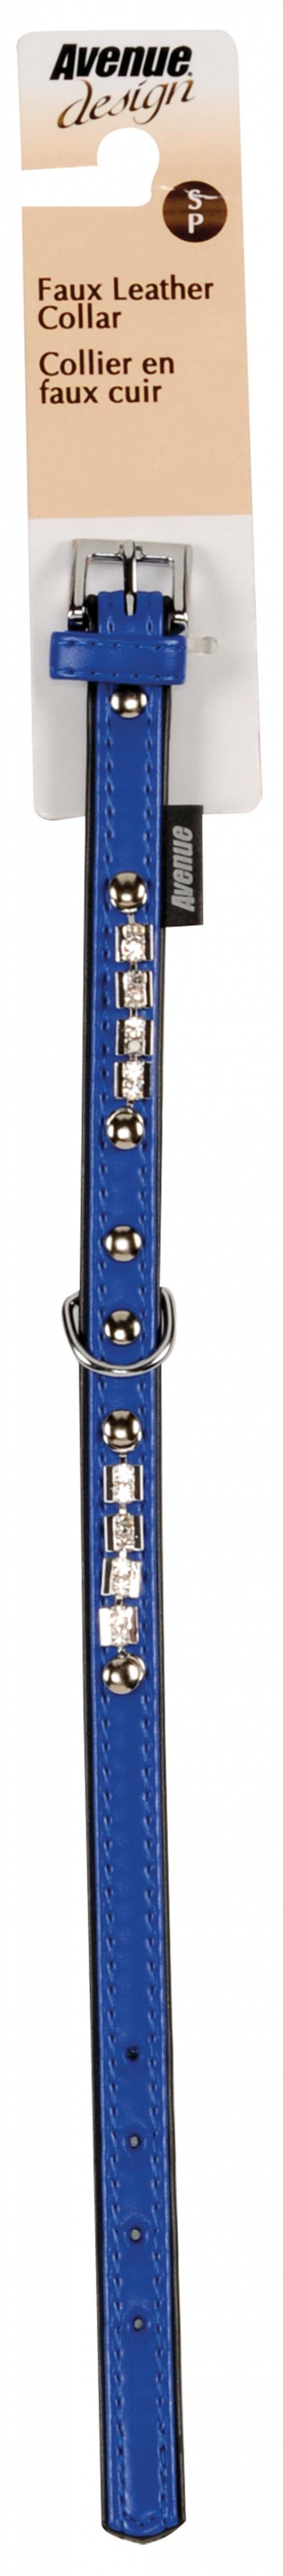 Obojek AVENUE Viva modrý S 32cm